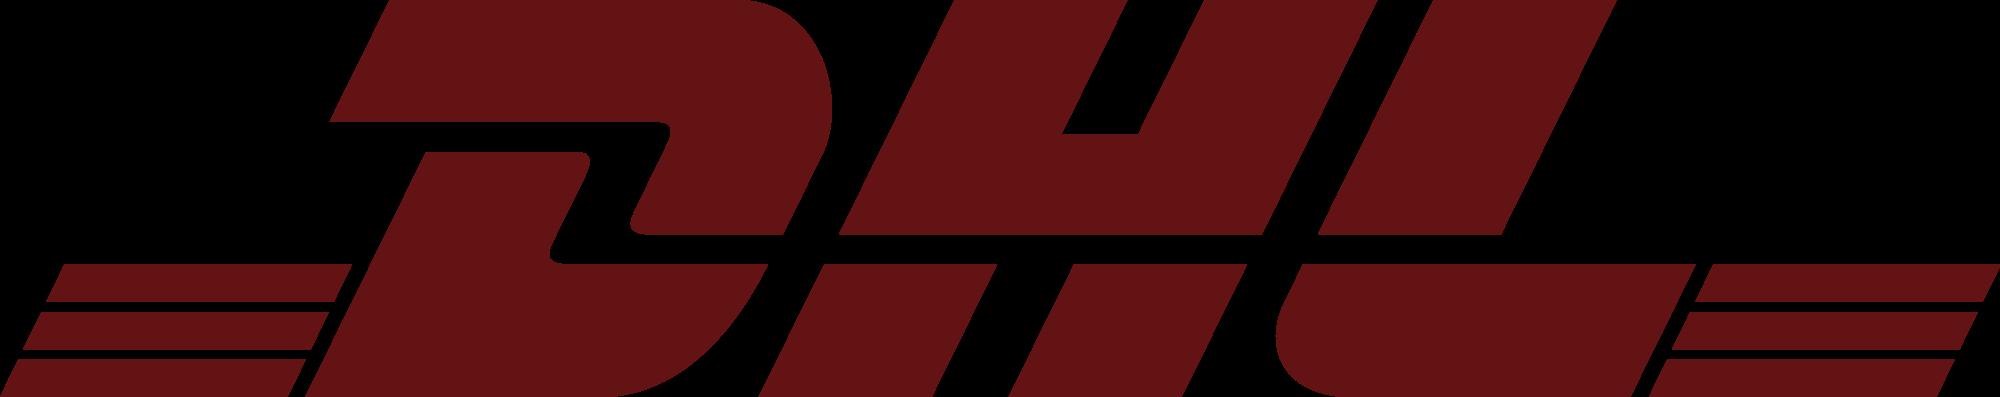 DHL.png - Dhl PNG